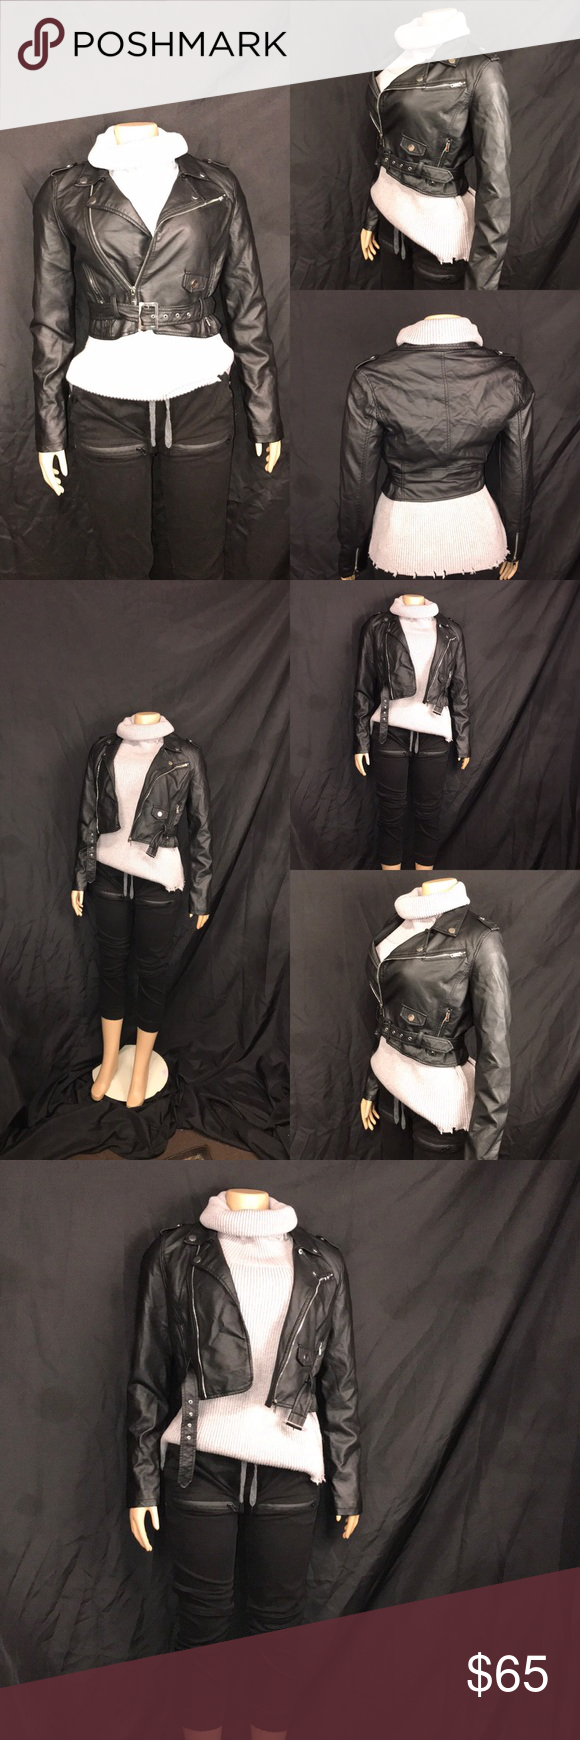 Ashley Outerwear By 26 International Moto Jacket Ashley Outerwear By 26 International Cropped Moto Jacket Belted Side Moto Jacket Cropped Moto Jacket Outerwear [ 1740 x 580 Pixel ]